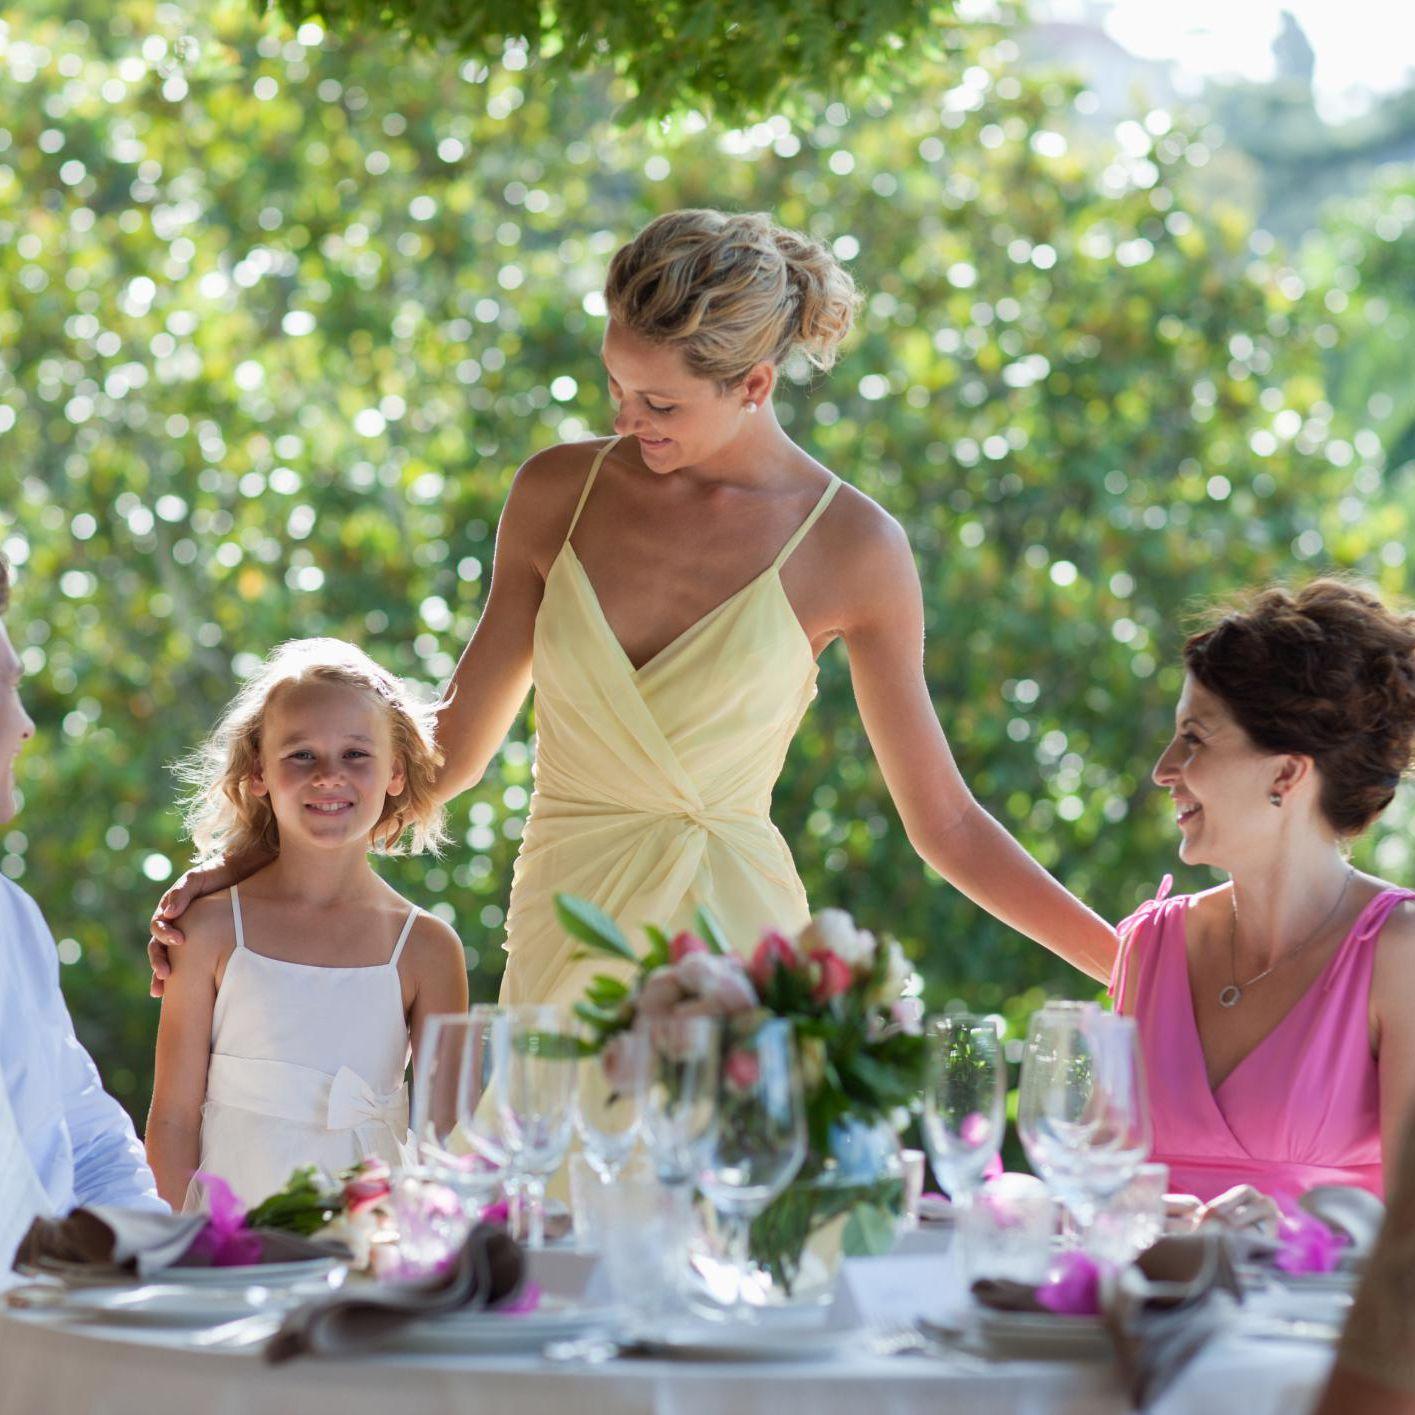 c2ad4347780 Proper Attire for a Daytime Wedding